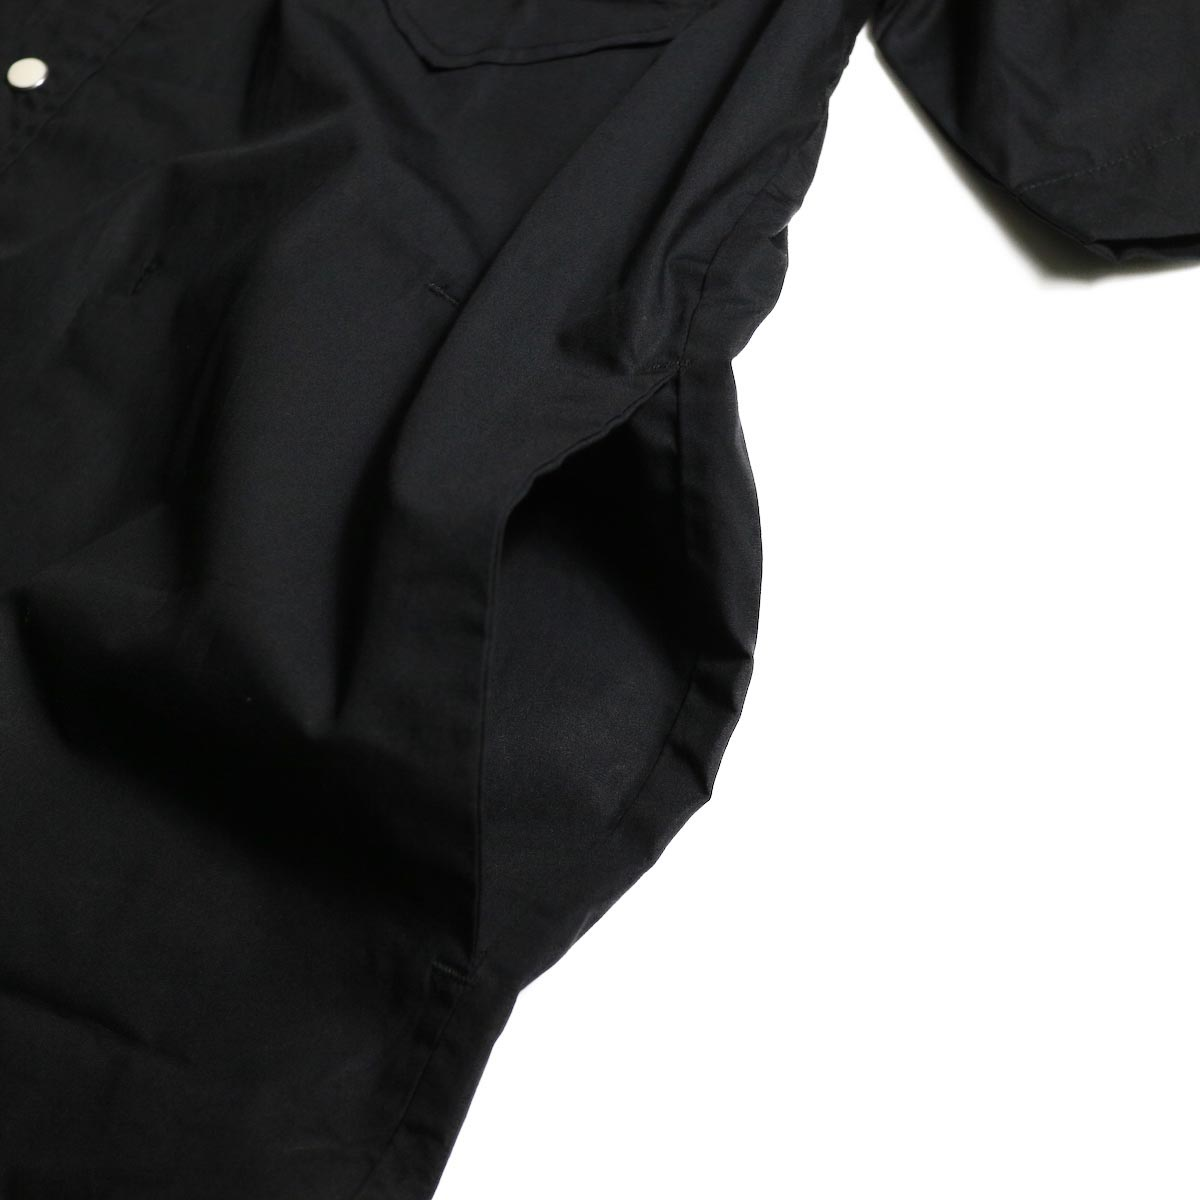 FUTURE PRIMITIVE / FP WESTERN SS SHIRT (Black)サイドポケット